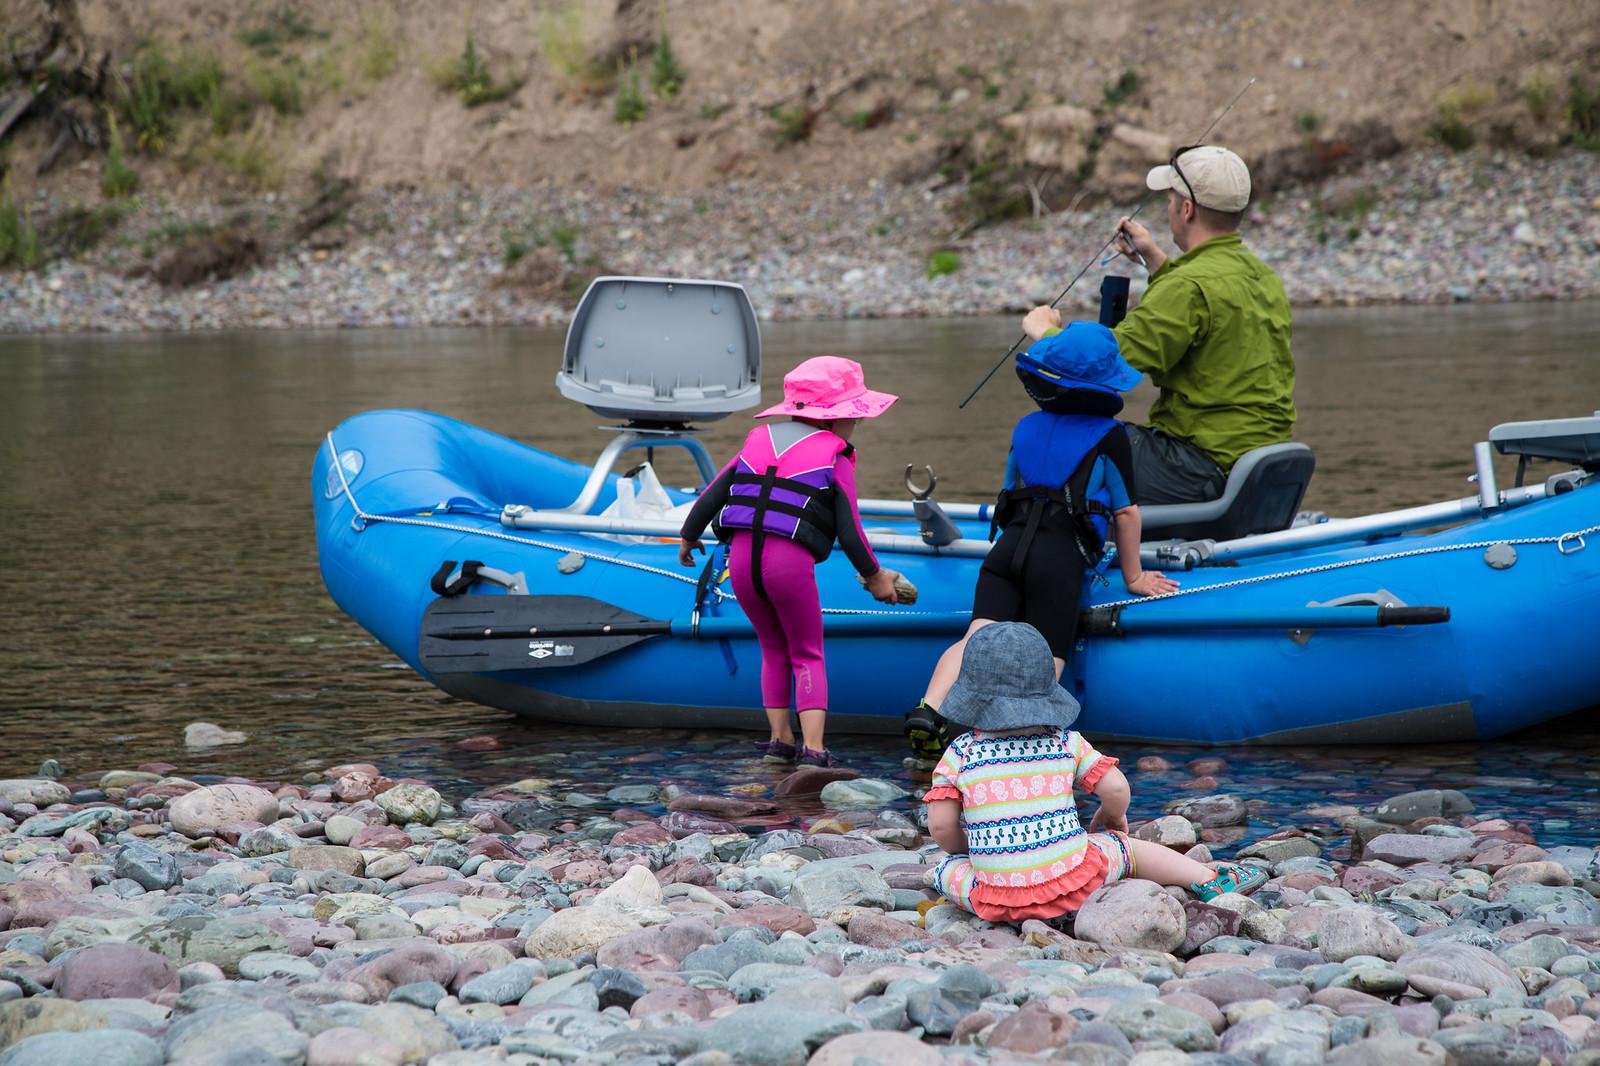 2015-07-10 Whitefish KOA and Float-9923.jpg